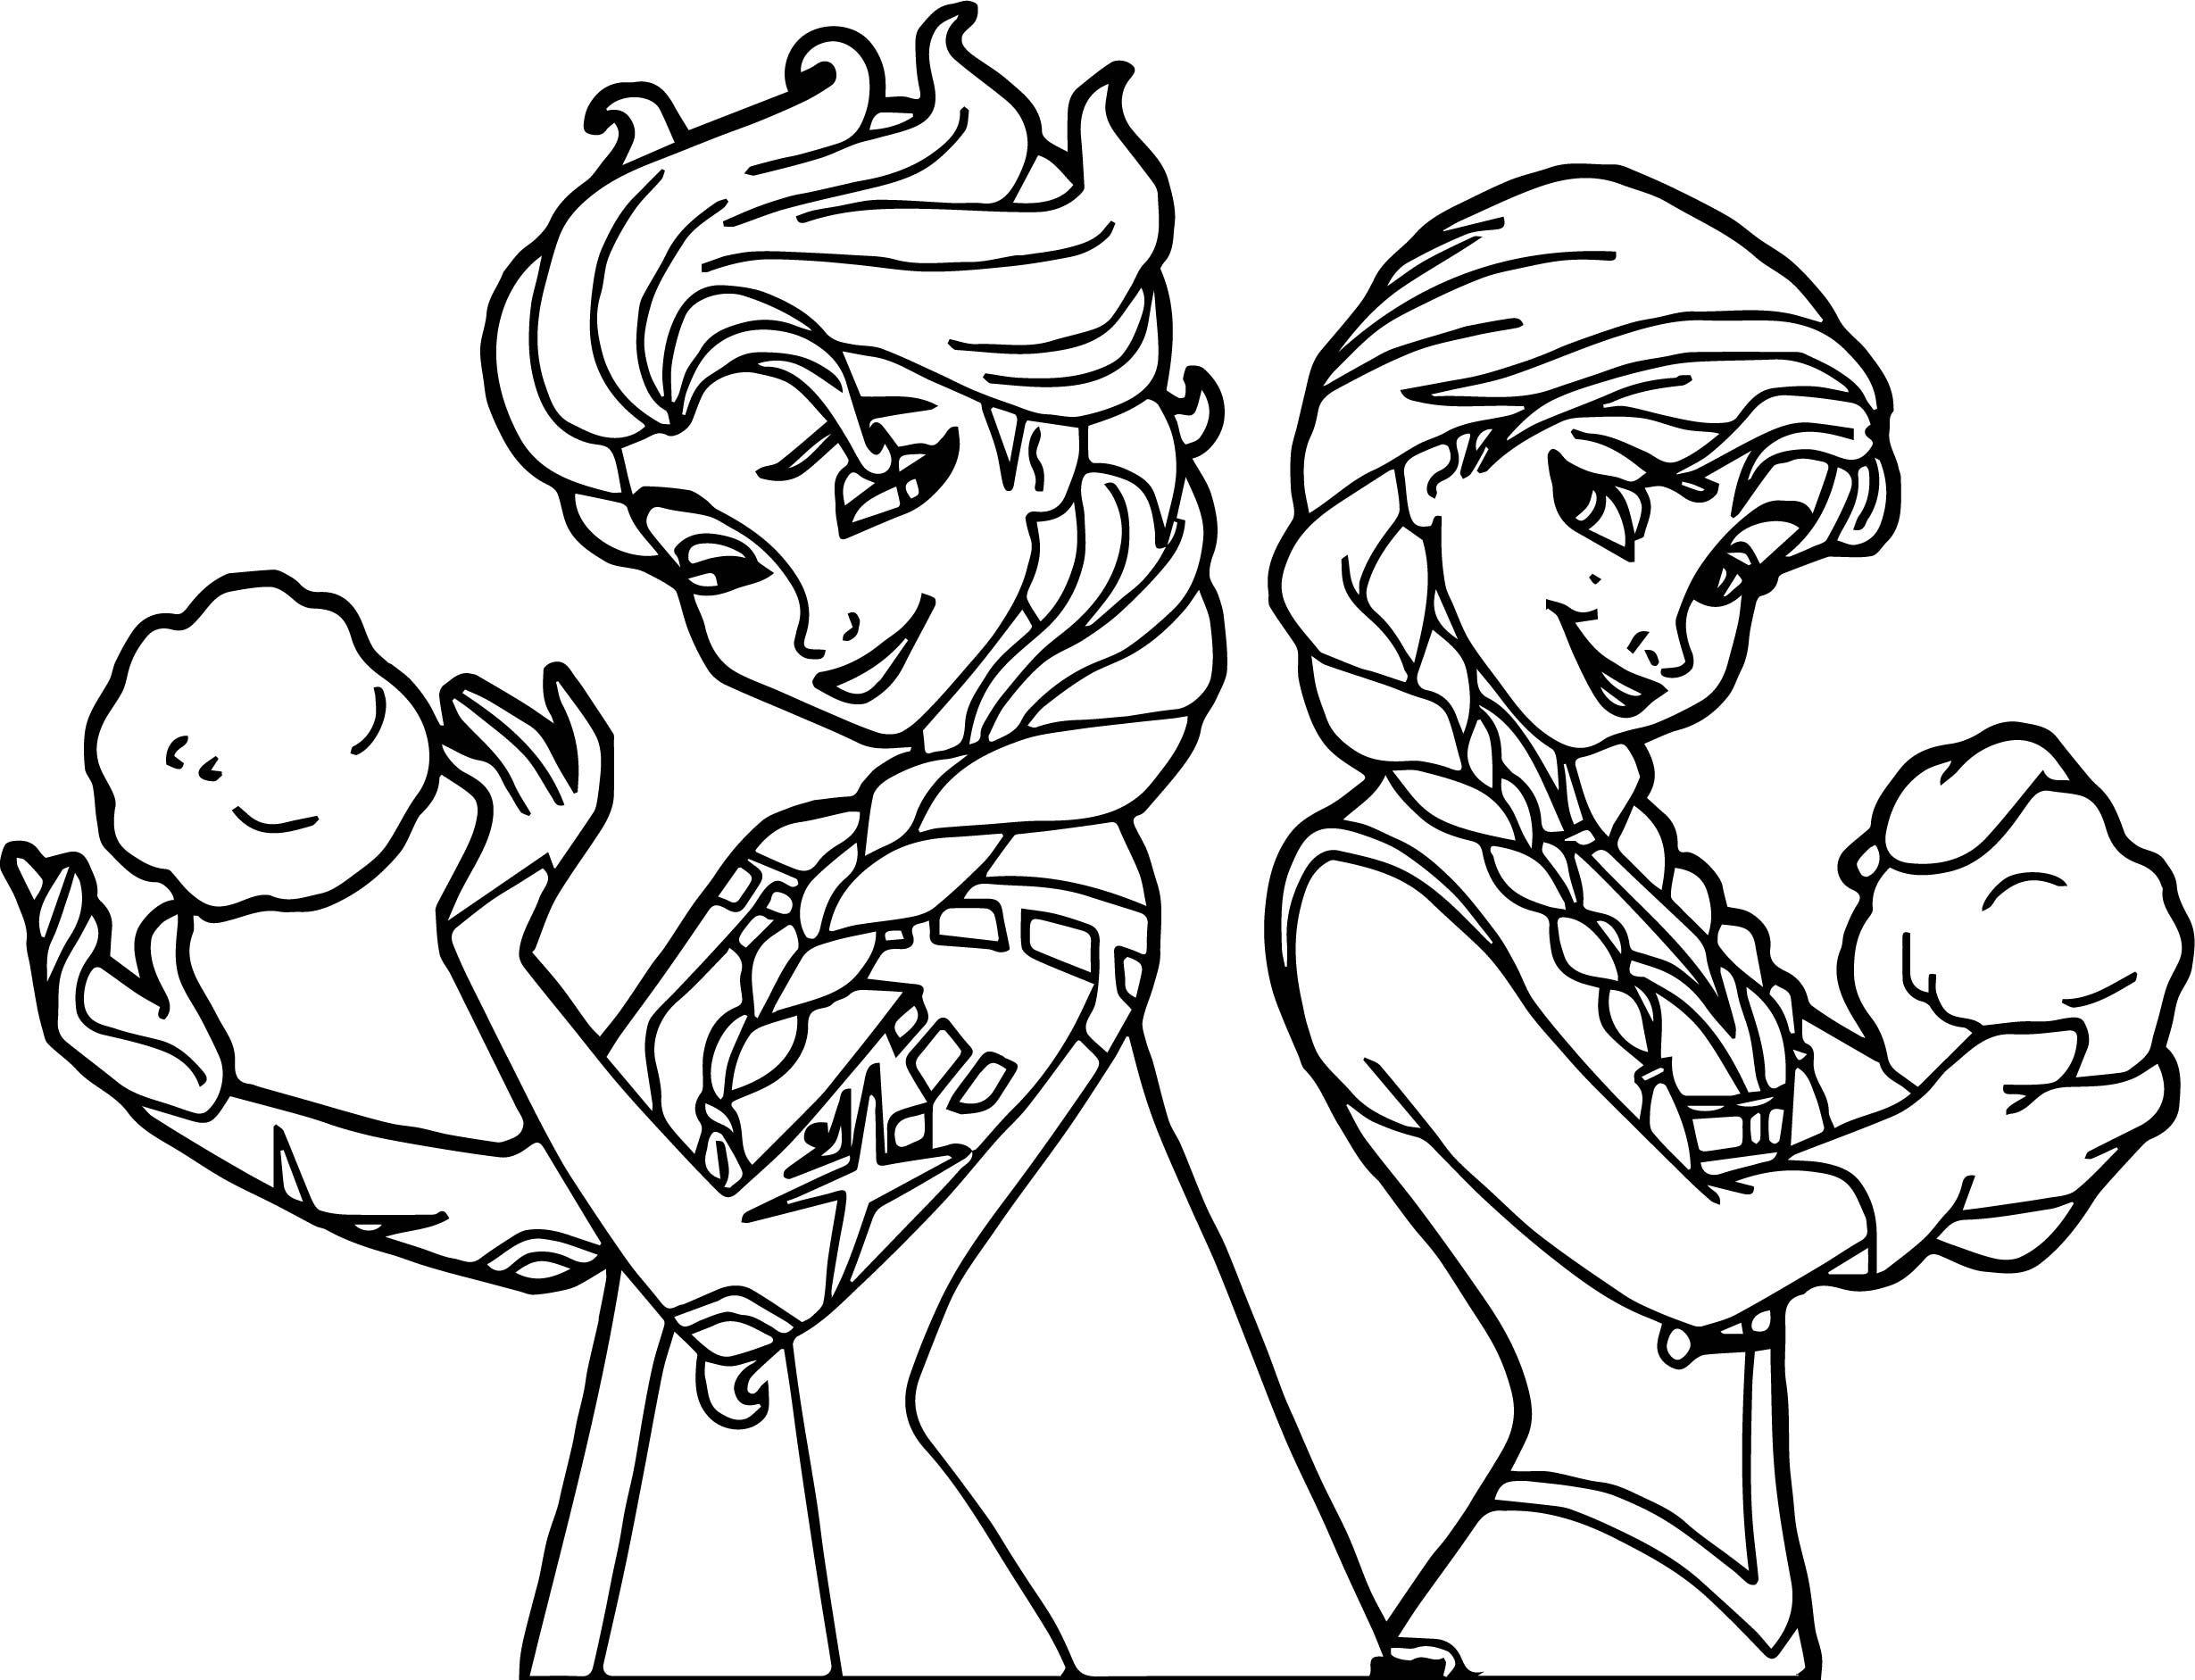 Cool Elsa Anna Snowballs Coloring Page Elsa Coloring Pages